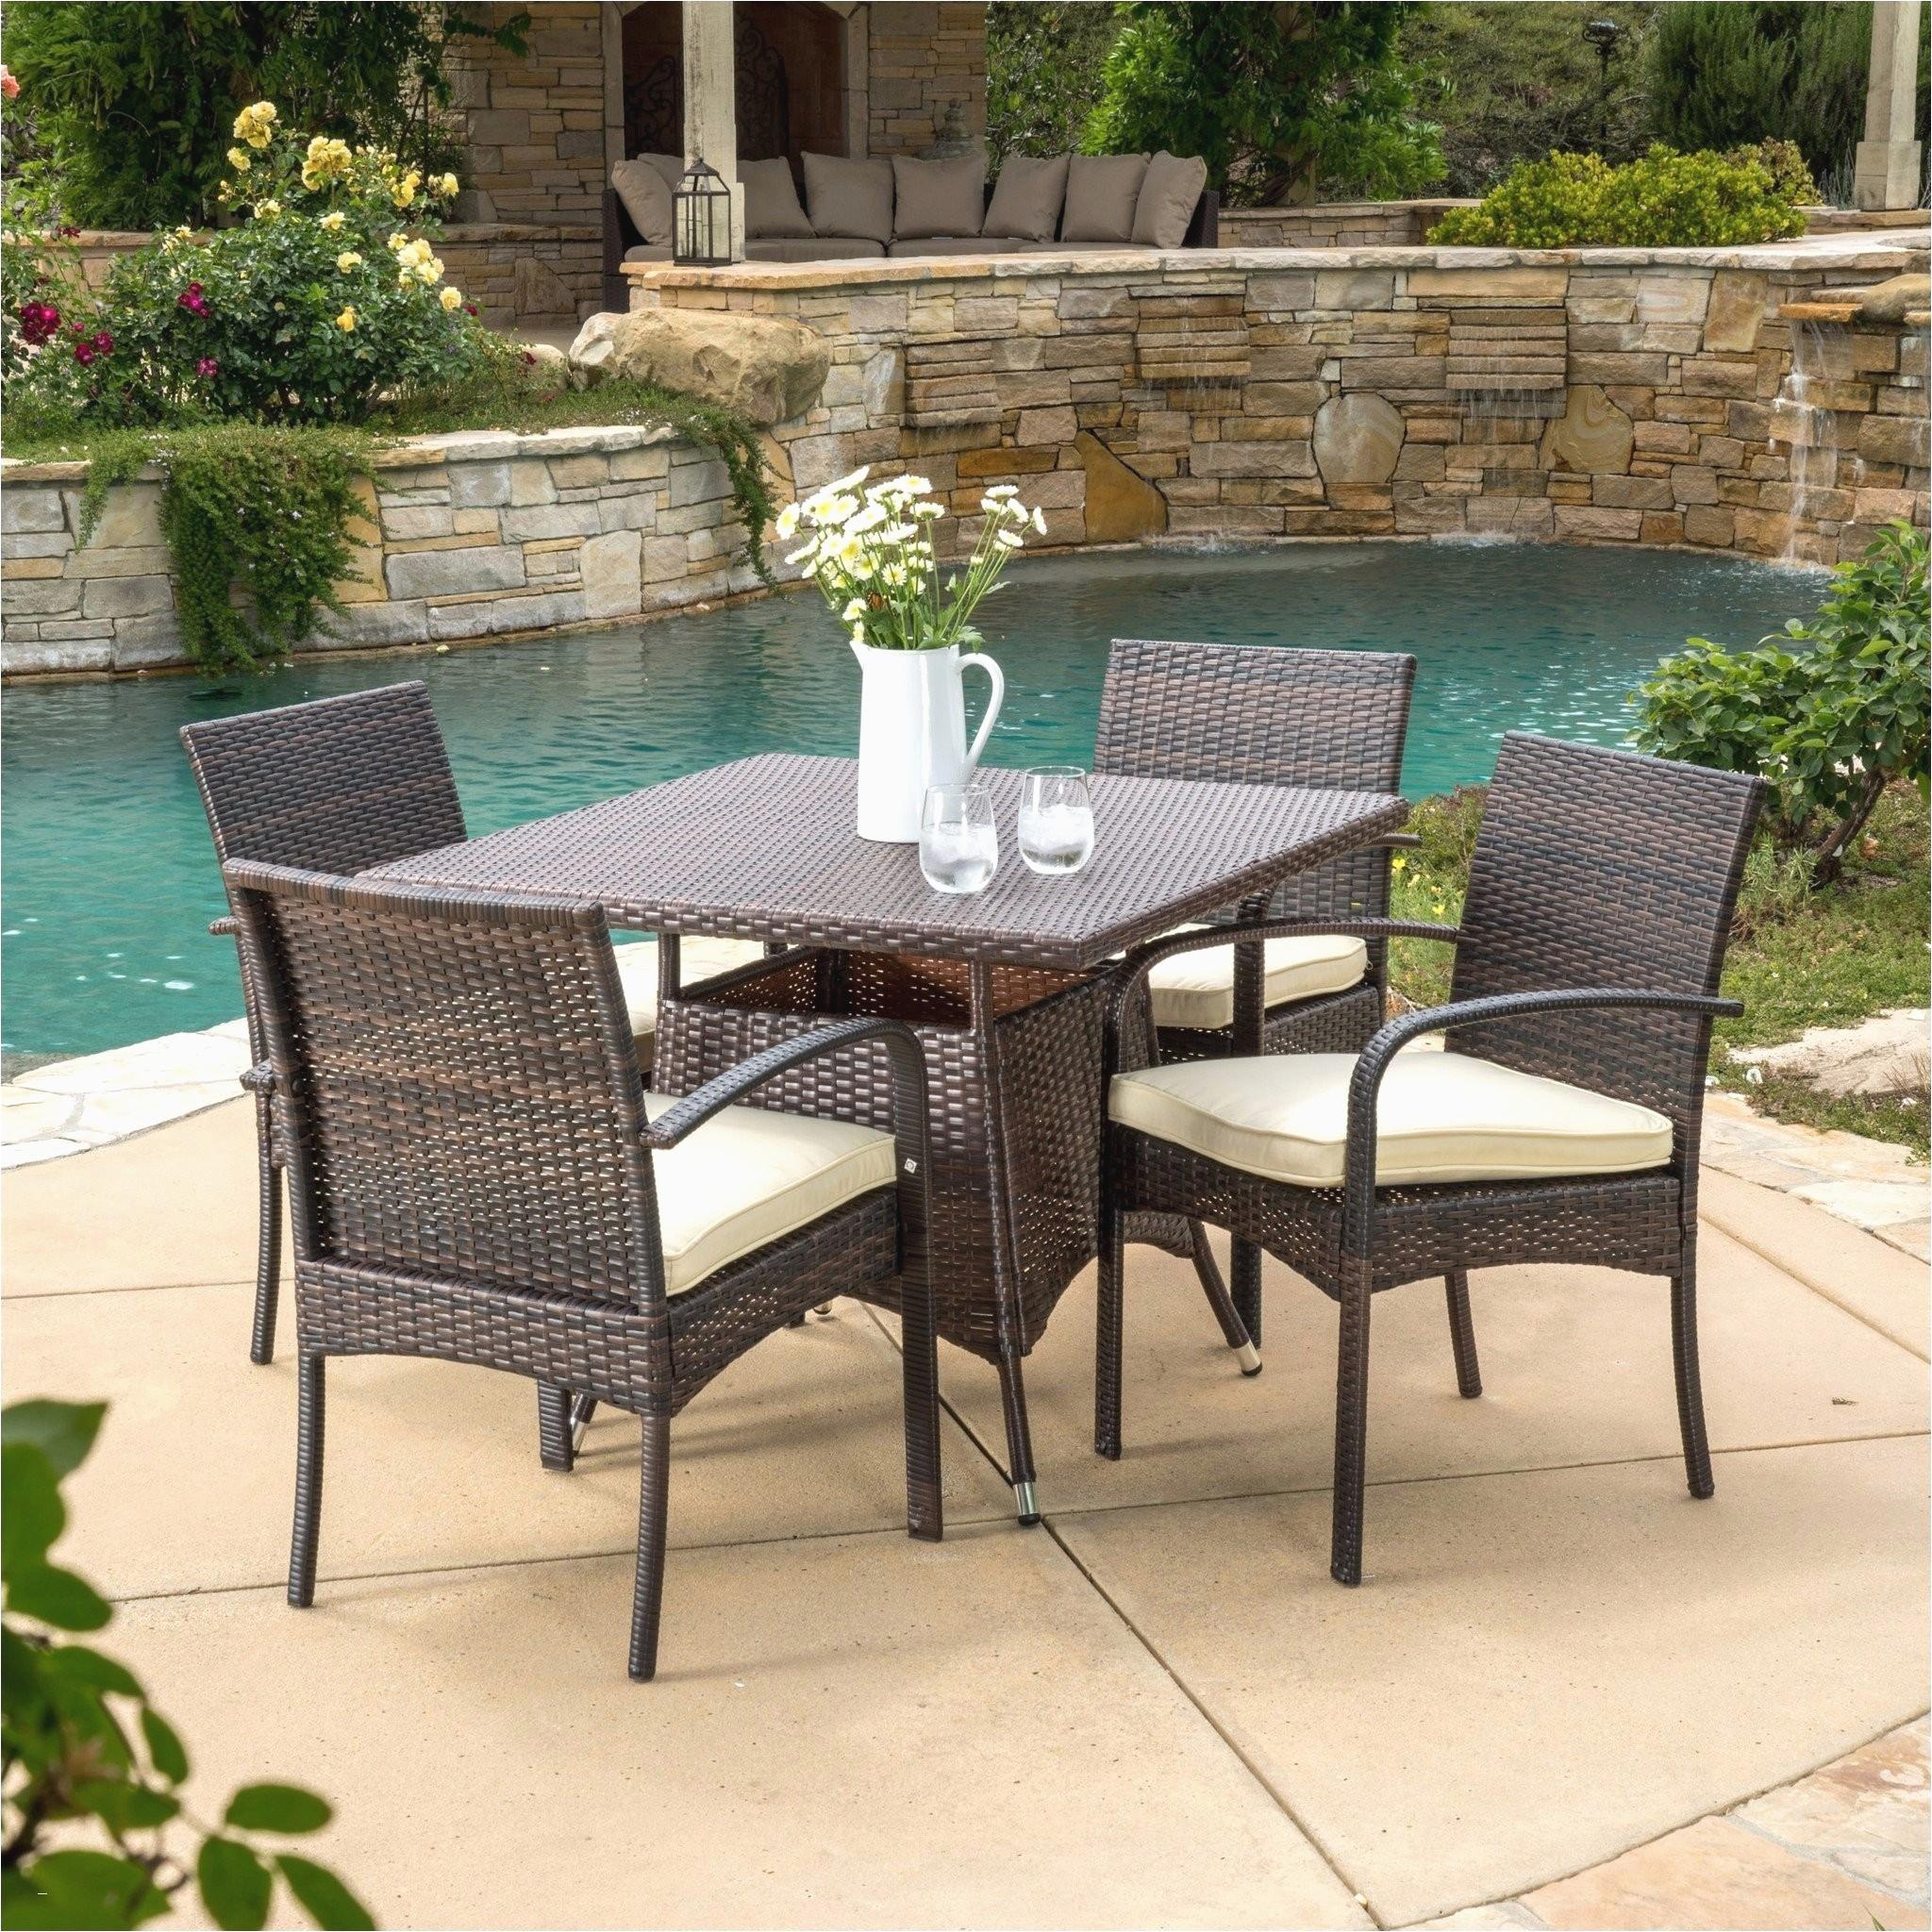 craigslist outdoor furniture new your unusual patio ideas part 5